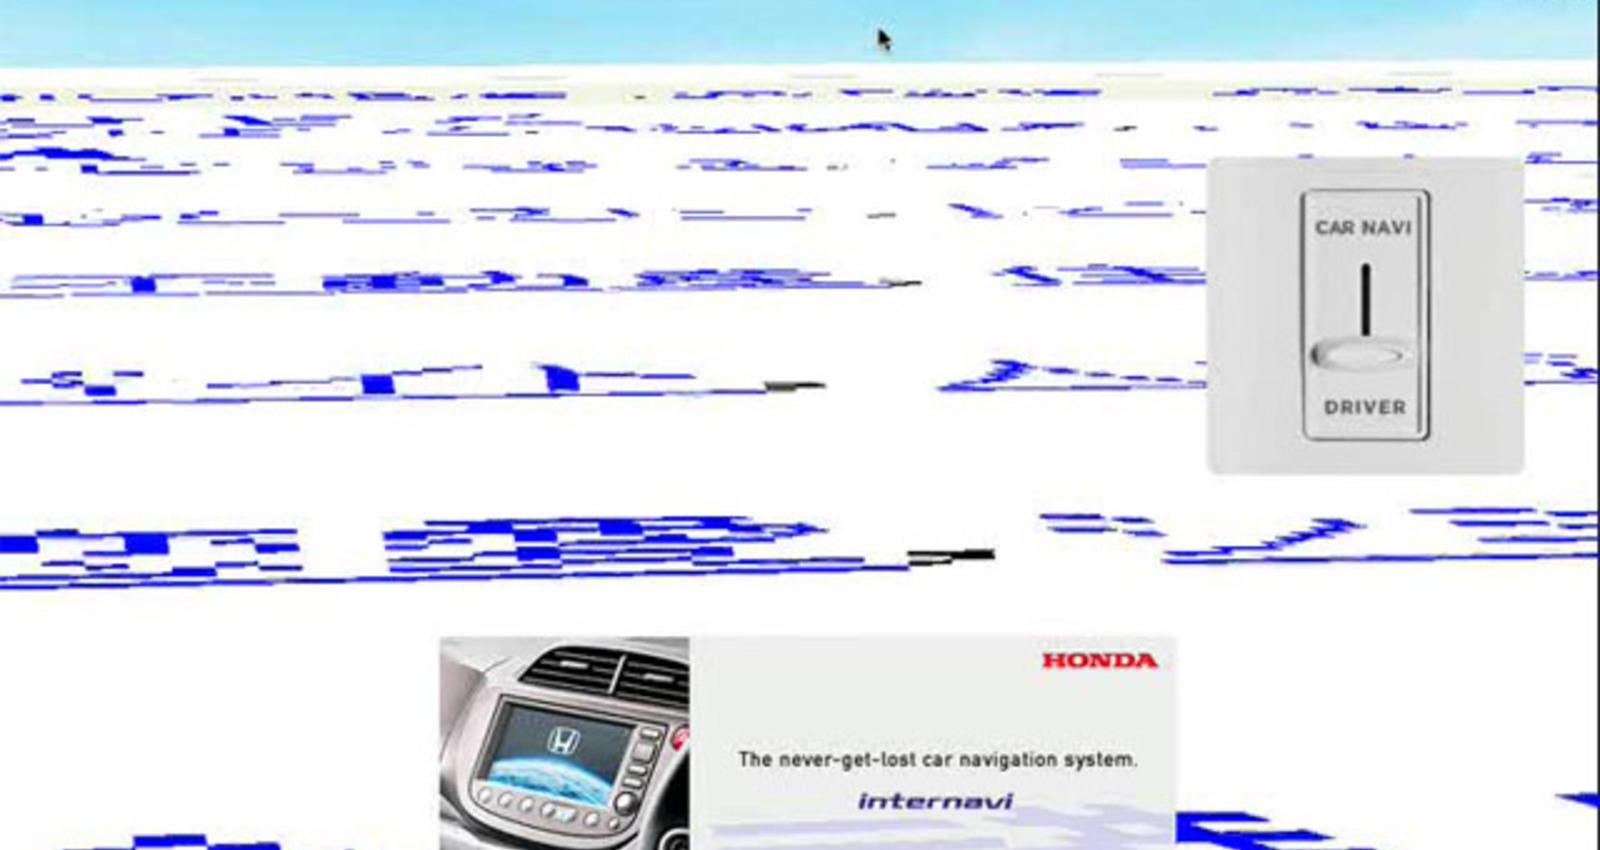 Honda Internavi